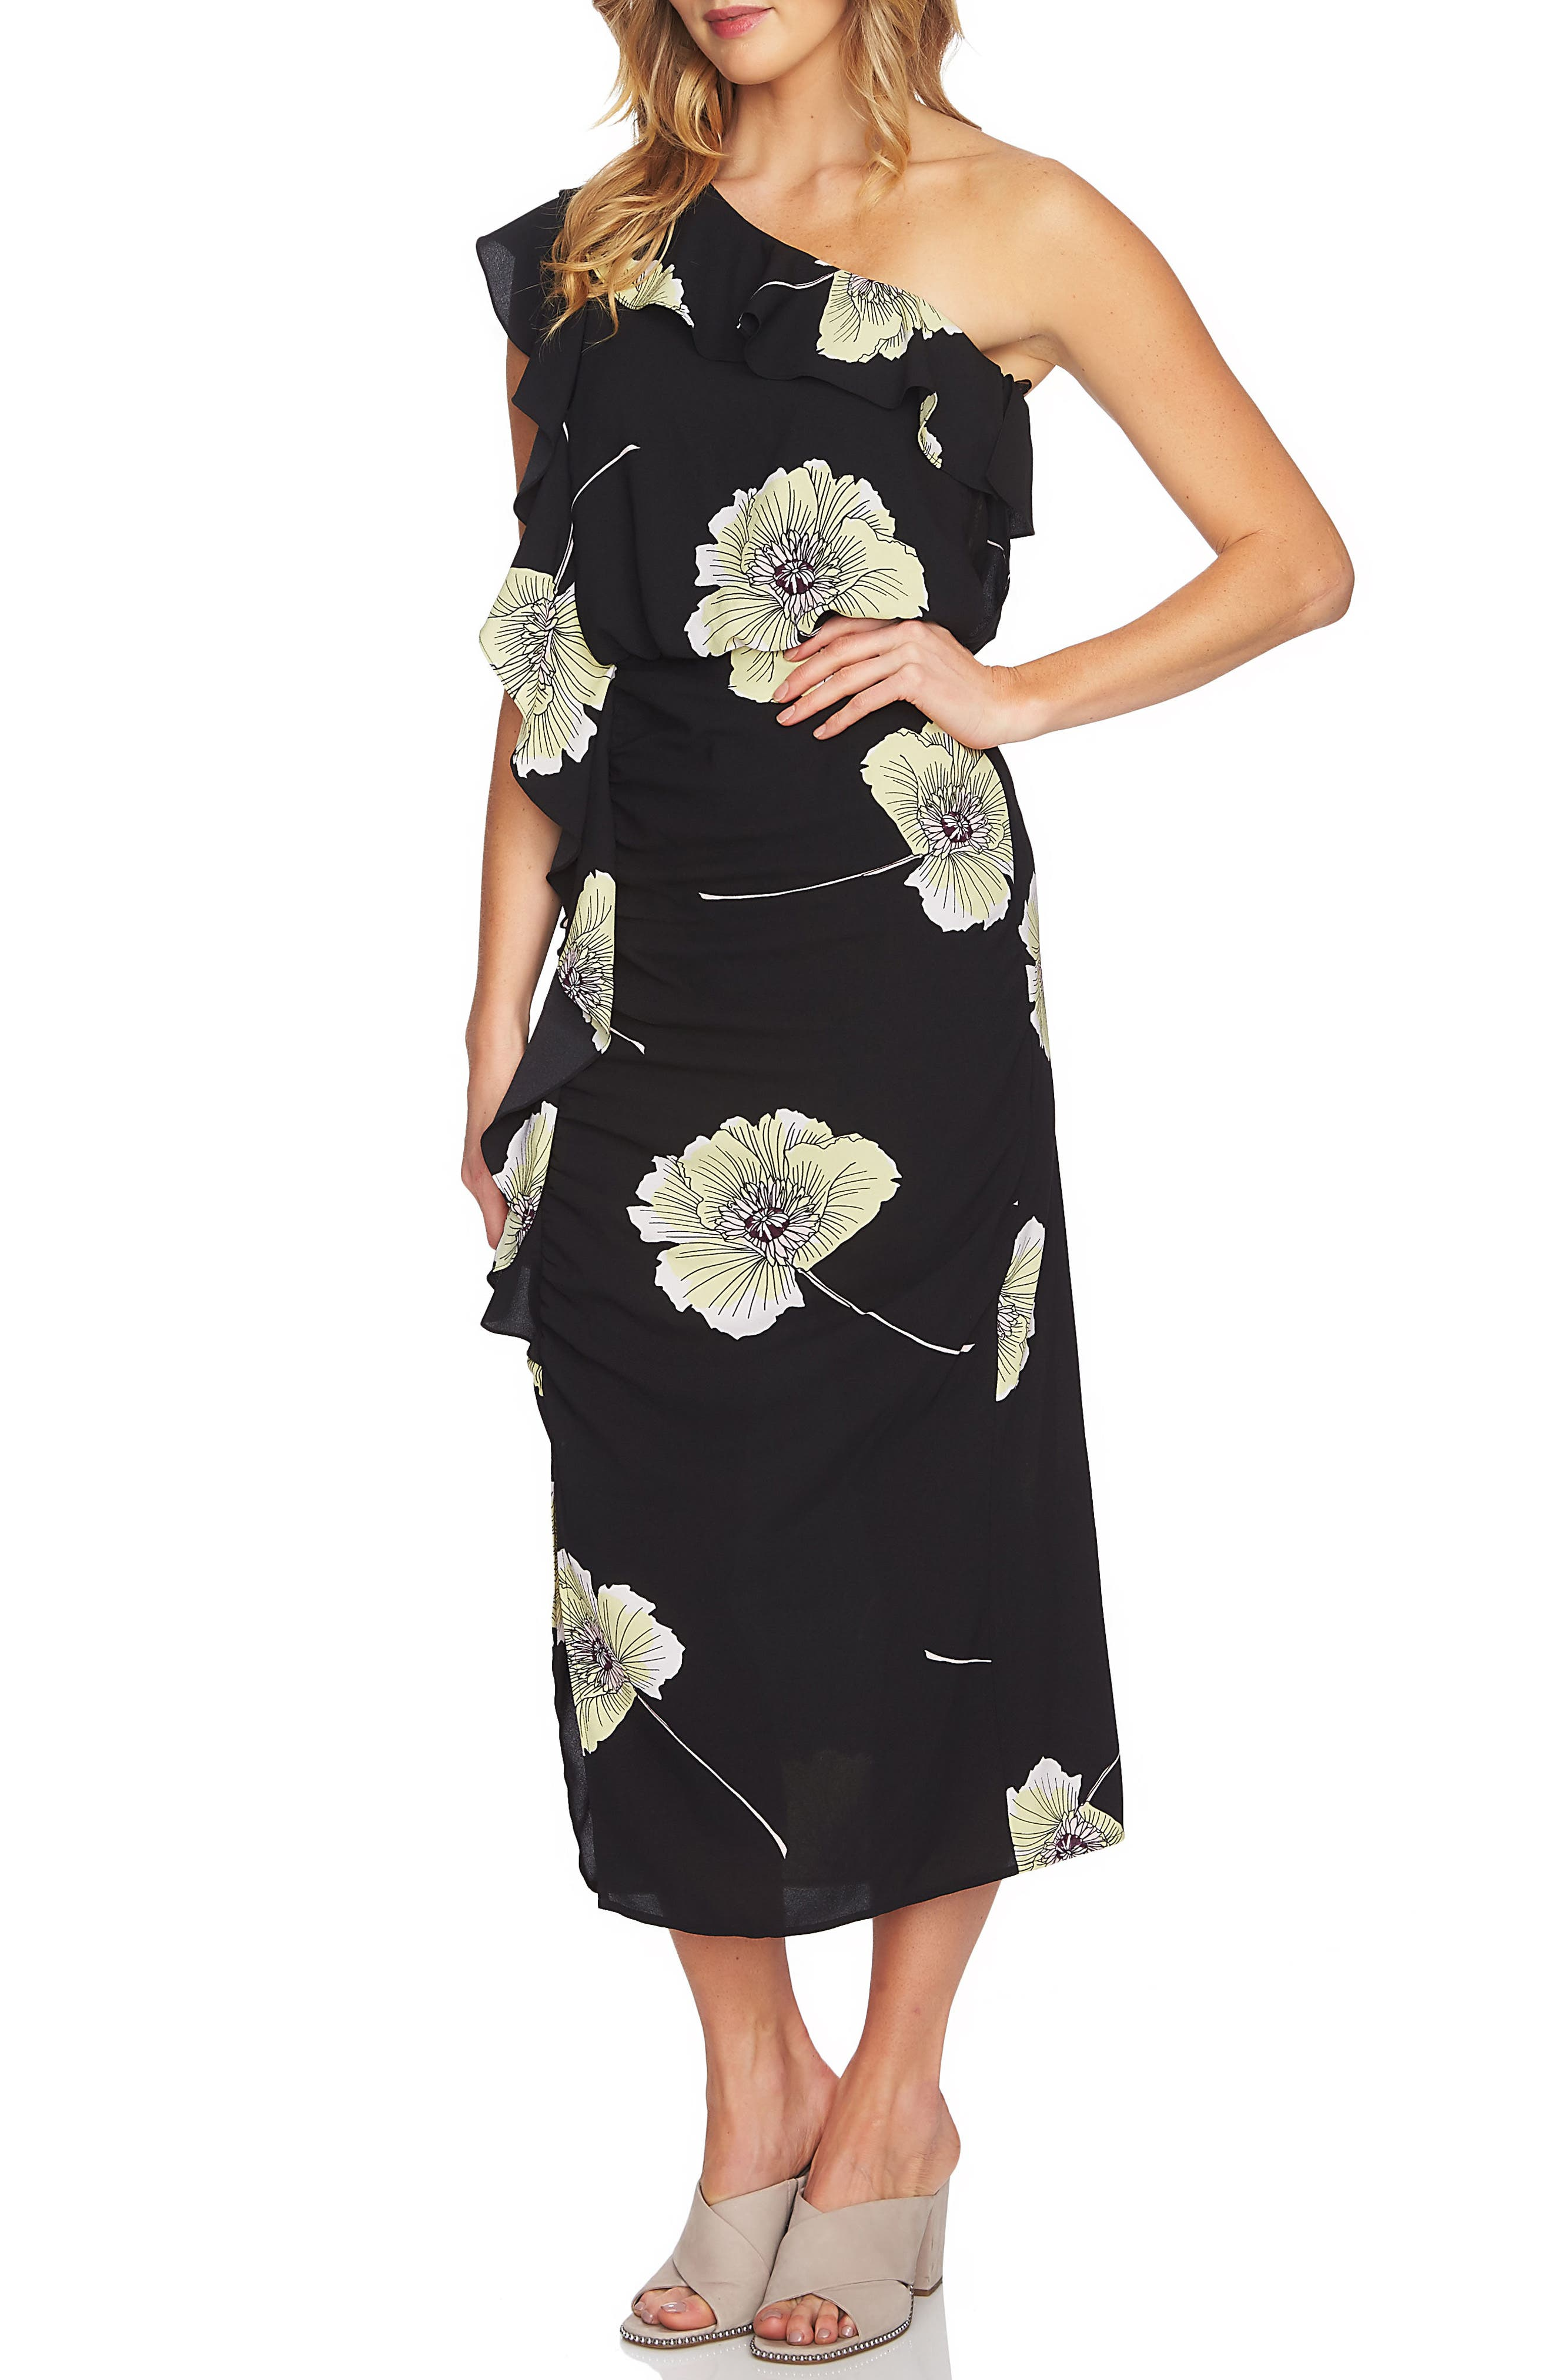 Alternate Image 1 Selected - 1.STATE Ruffle One-Shoulder Midi Dress